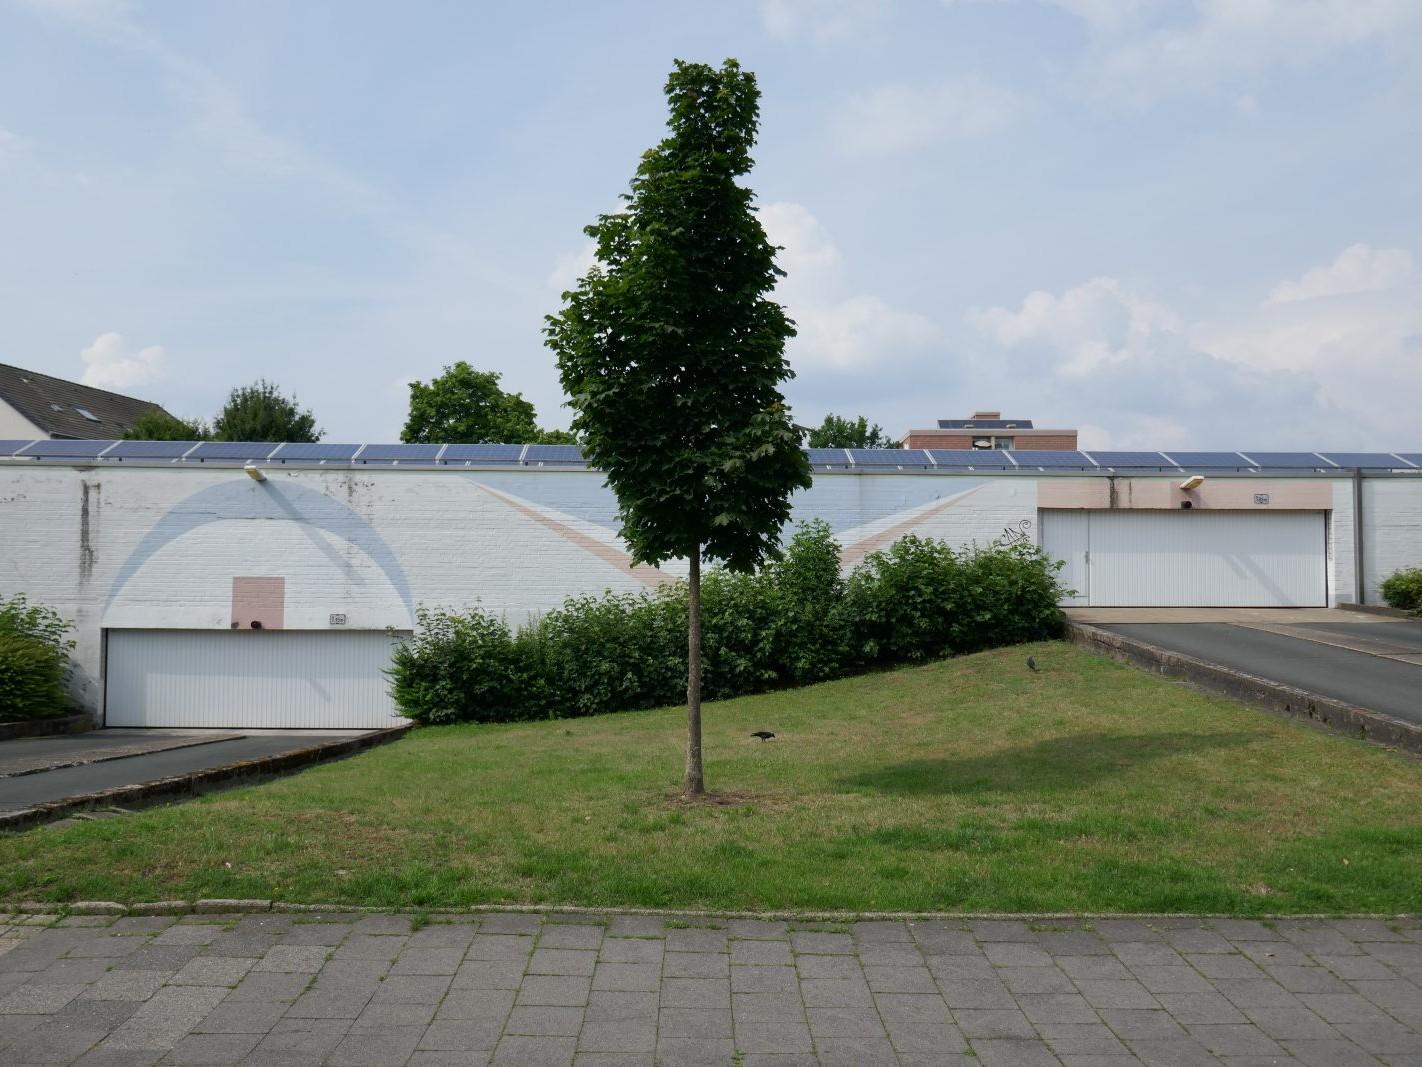 Münster vor Ort: Coerde - Garage Breslauer Straße - Foto: Stefan Rethfeld